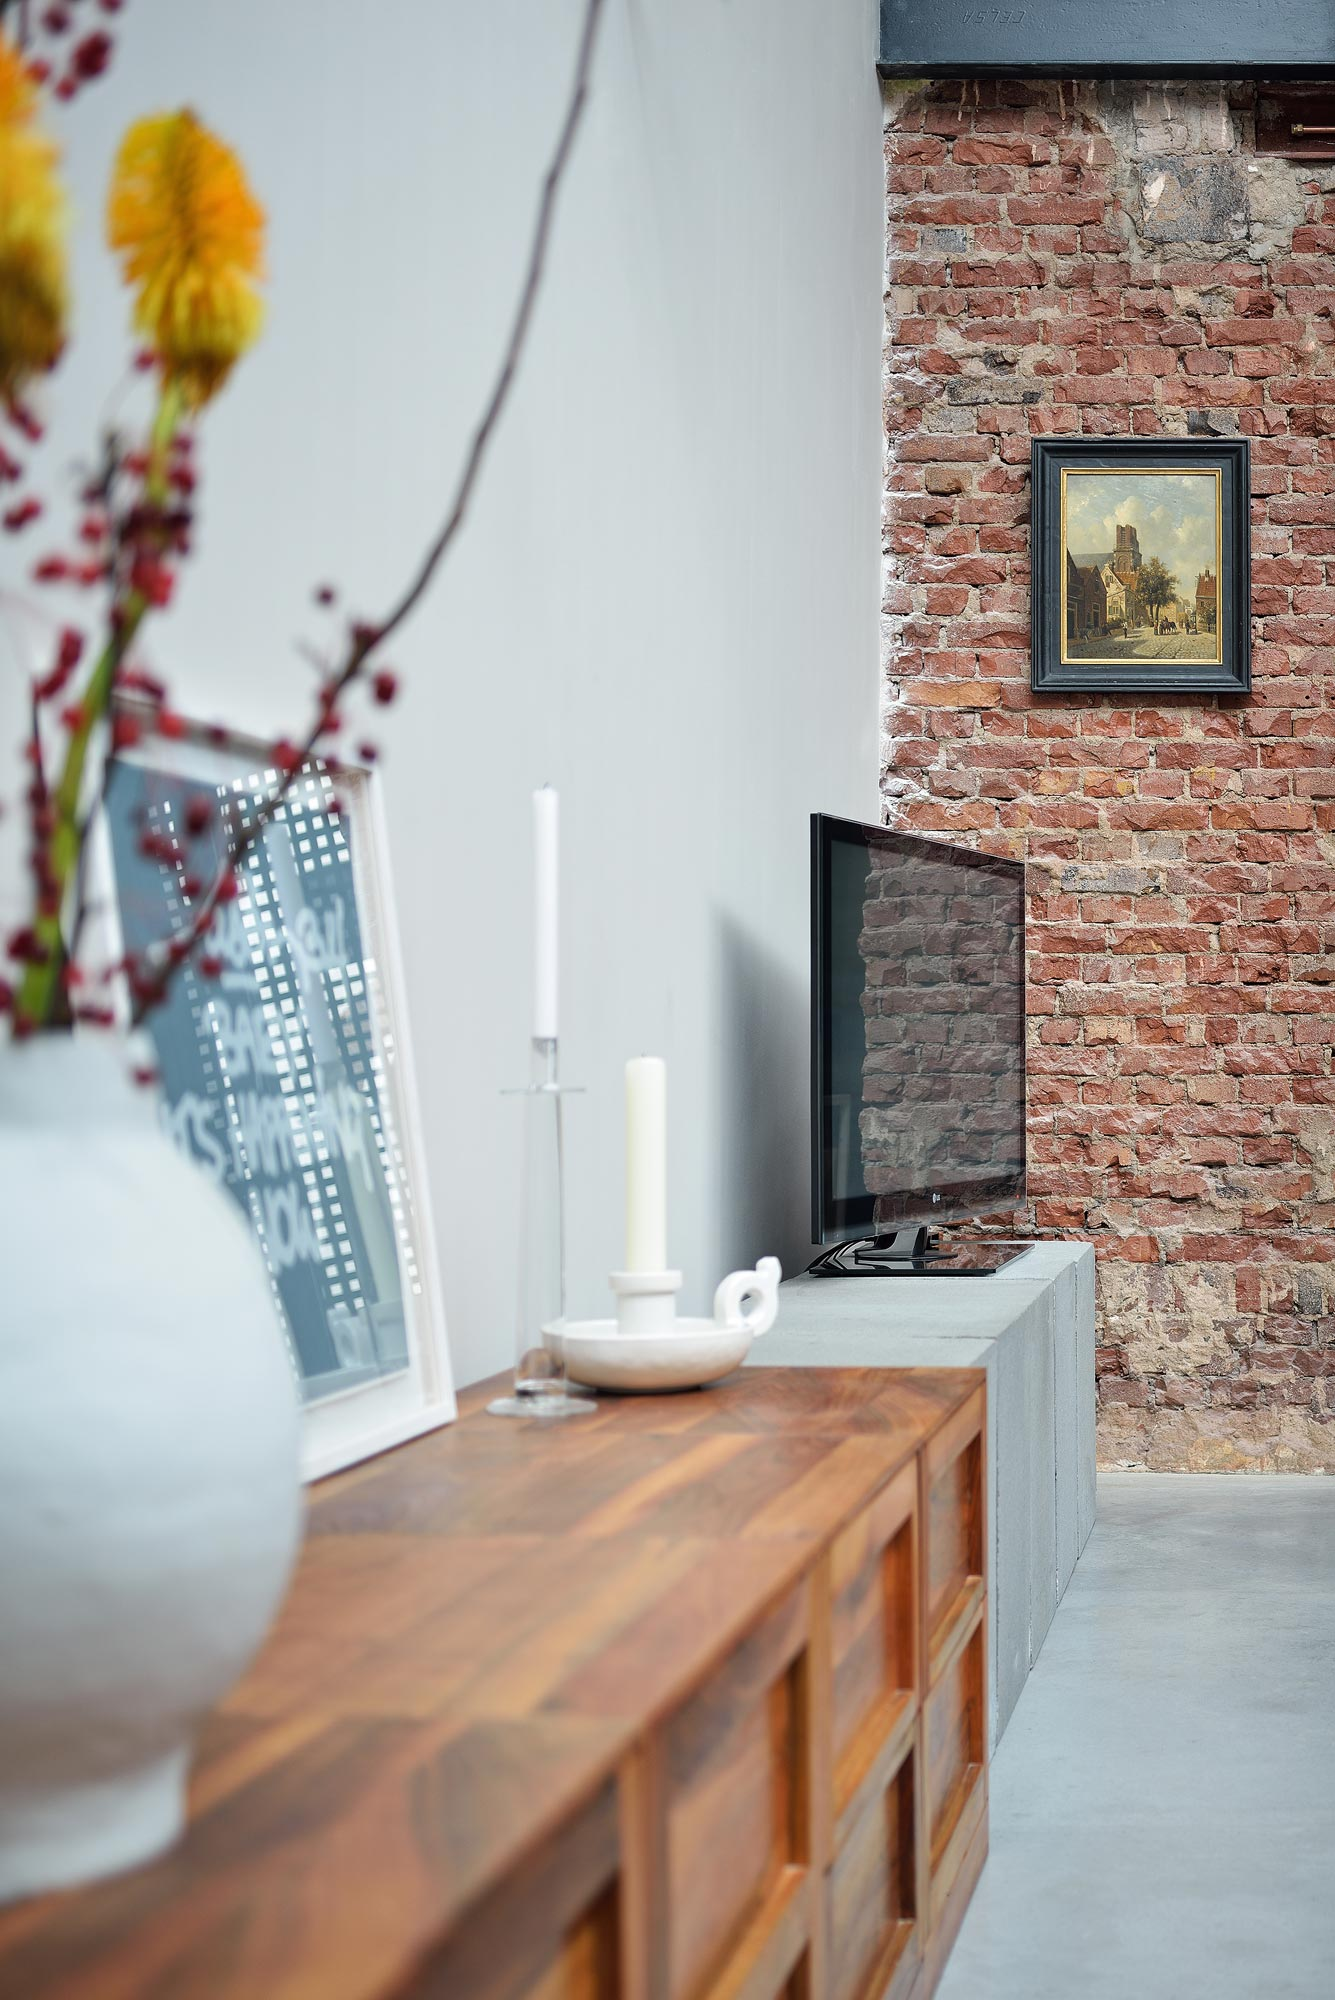 Tandwielenfabriek Amsterdam - interieurfotograaf Chiel de Nooyer